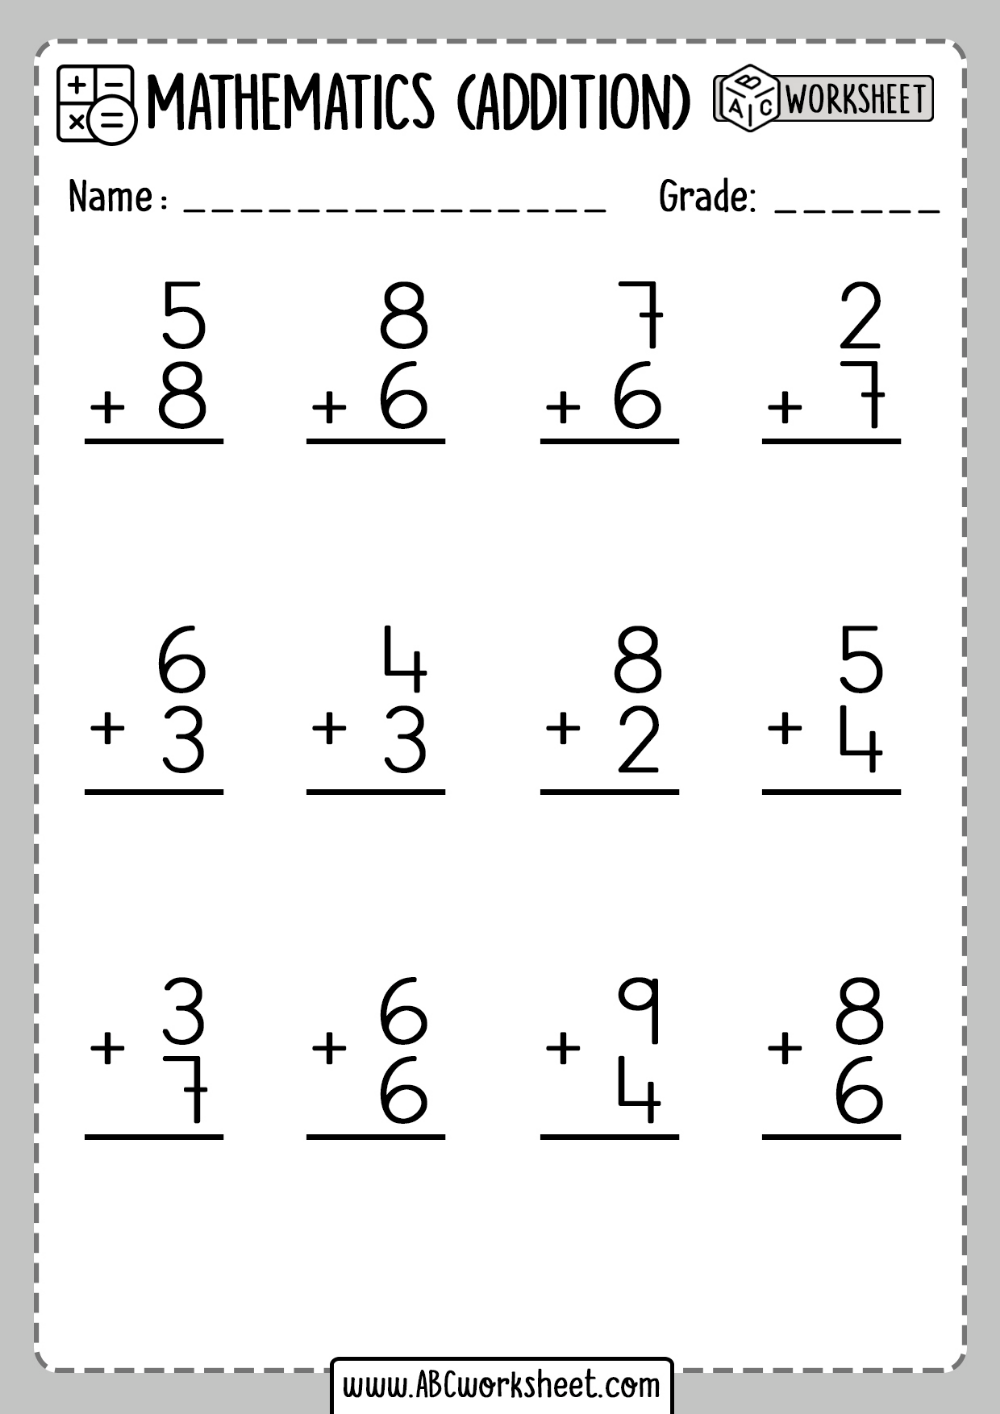 medium resolution of Addition Worksheet First Grade   Addition worksheets